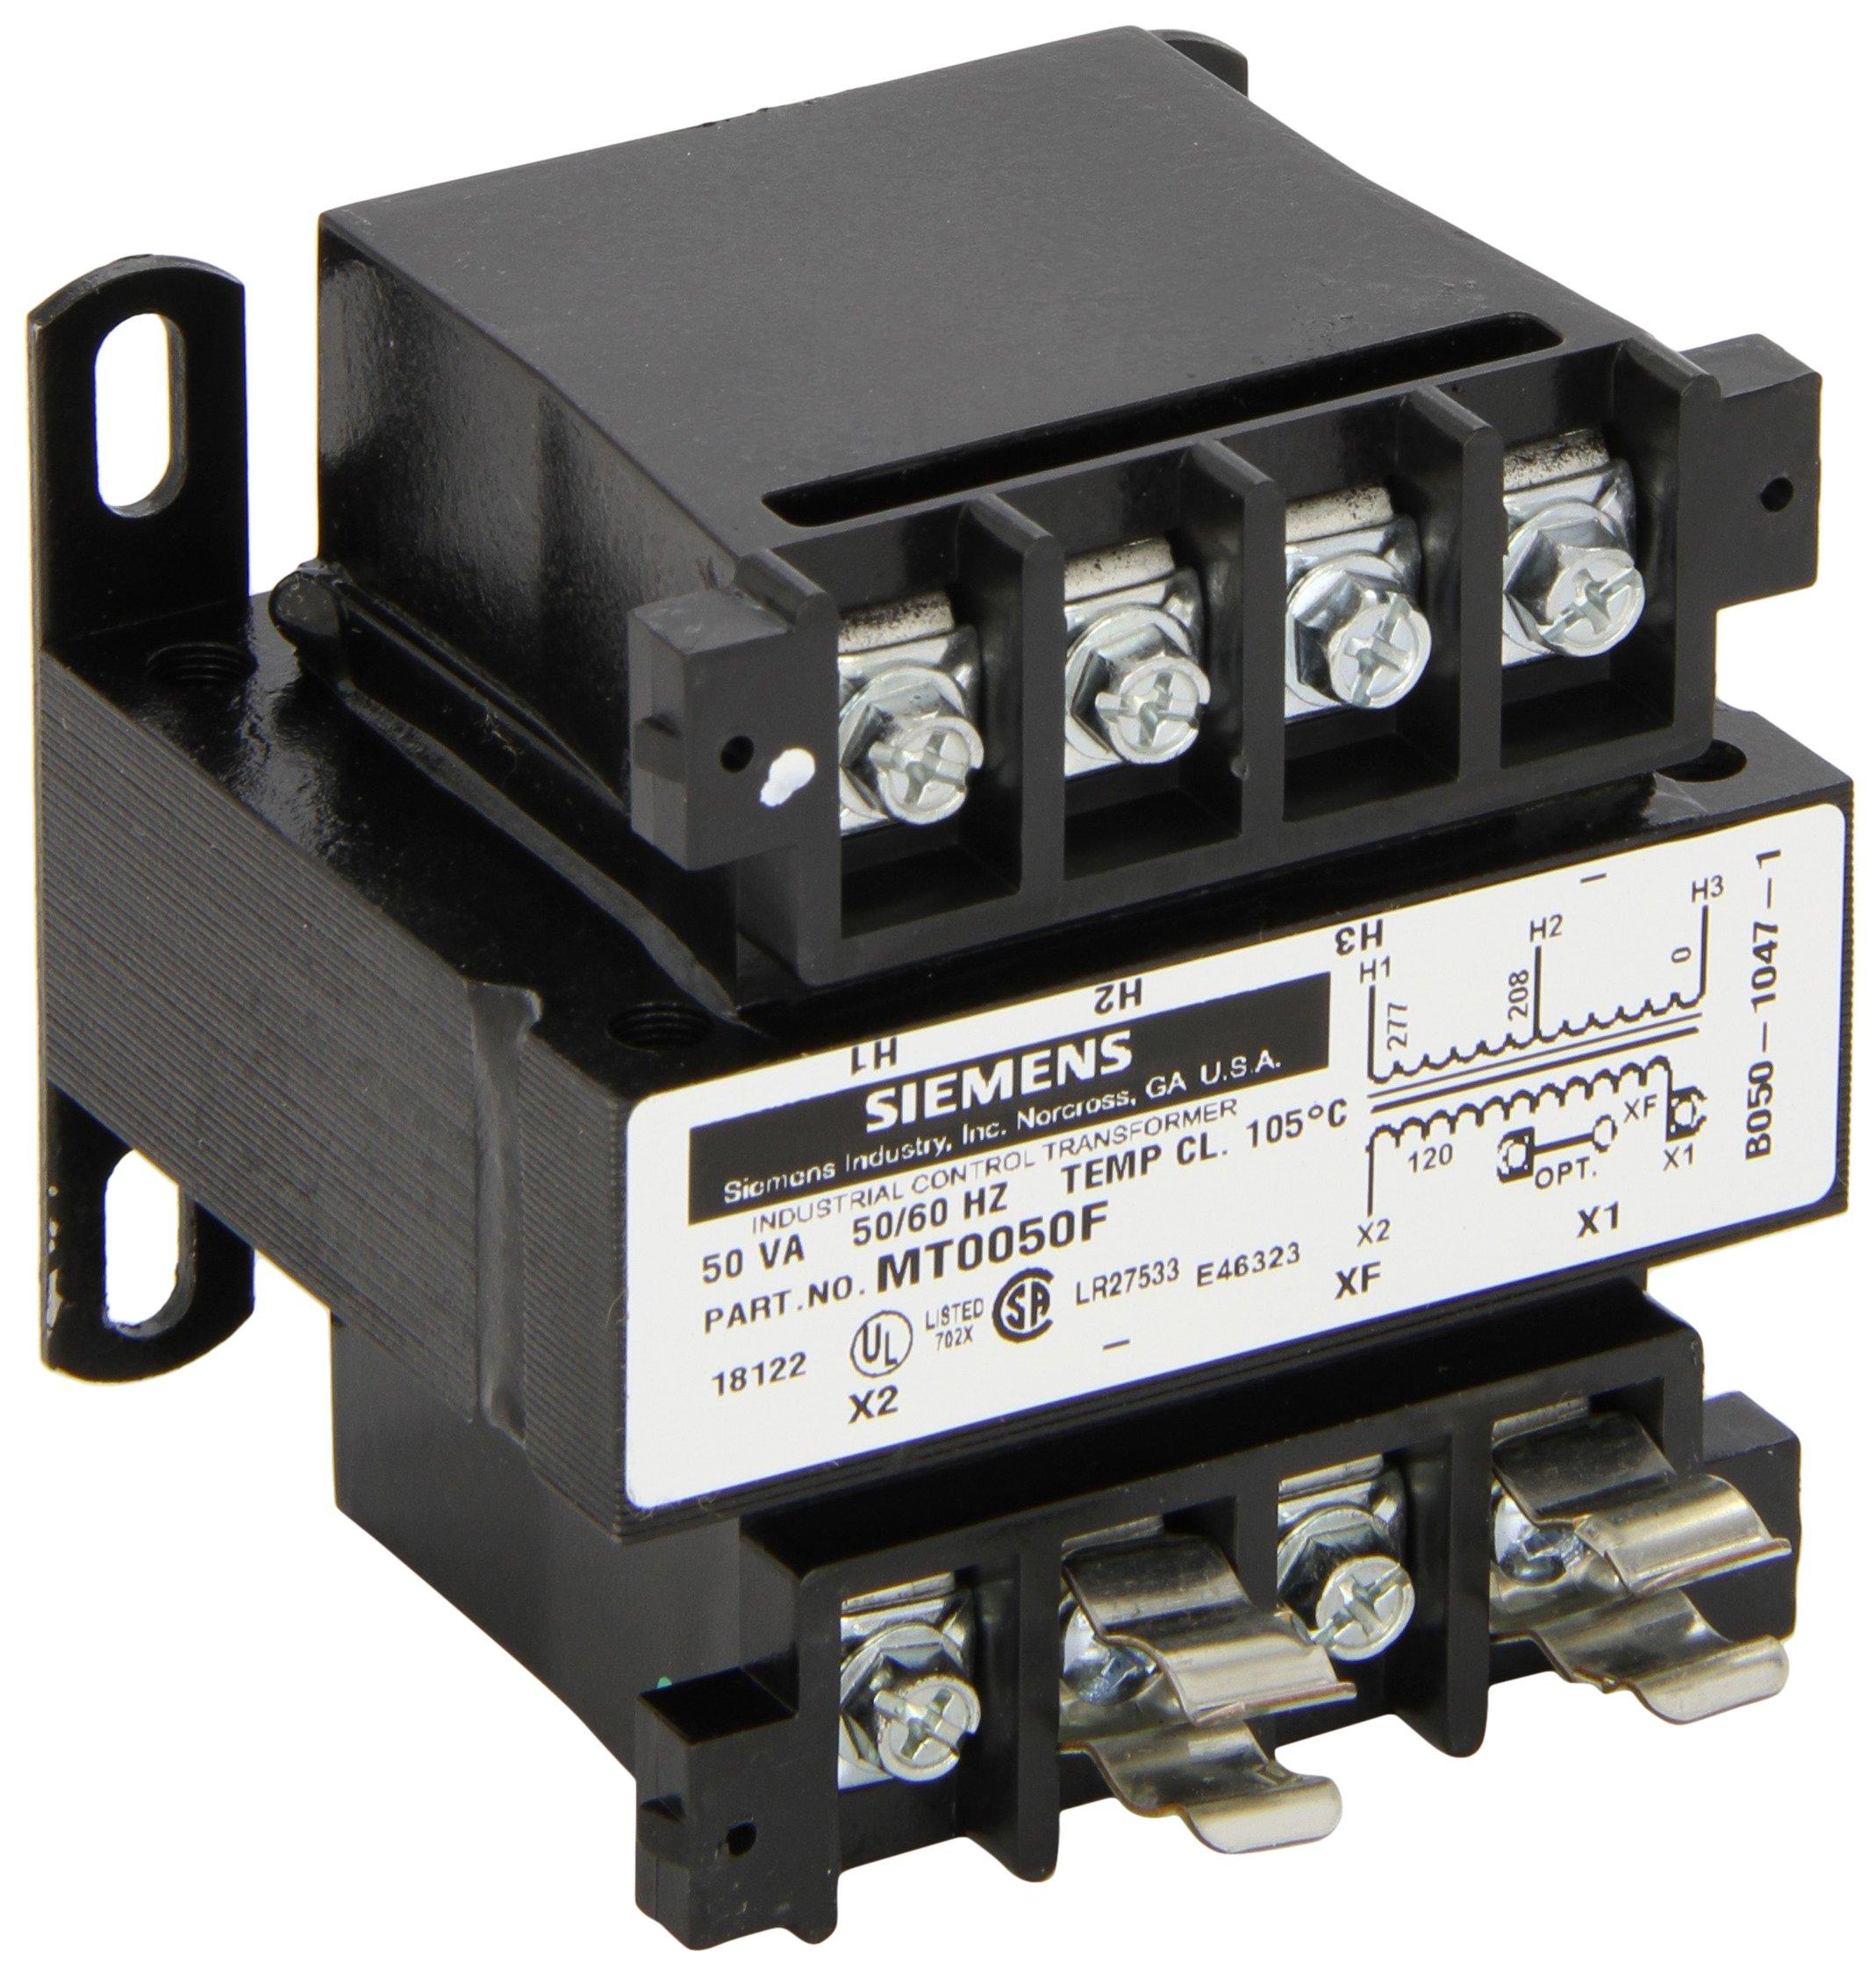 Siemens MT0050F Industrial Power Transformer, Domestic, 208/277 Primary Volts 50/60Hz, 120 Secondary Volts, 50VA Rating